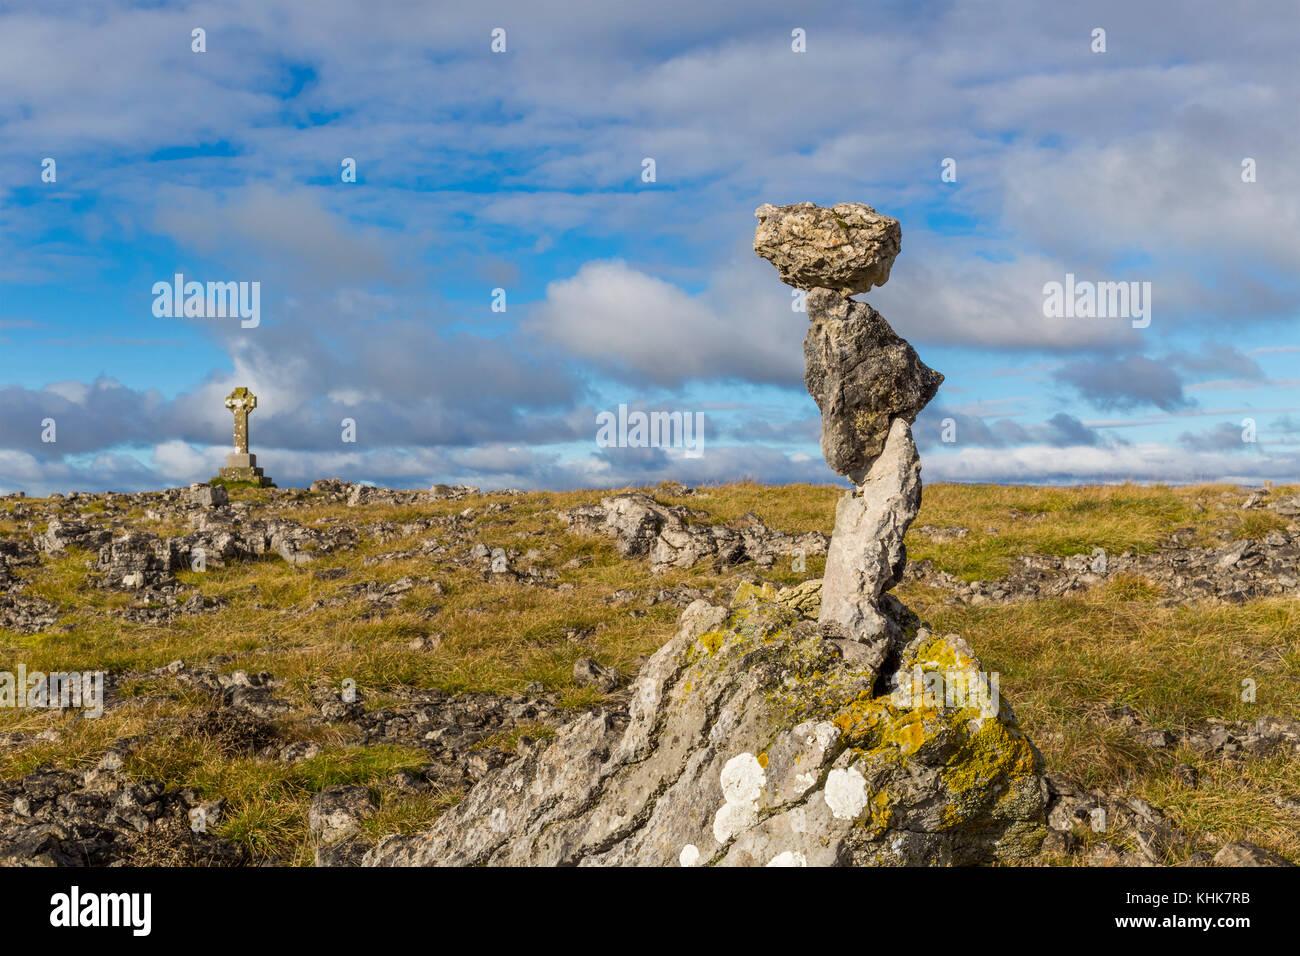 Limestone Rocks Carefully Balanced on Top of Beacon Hill near Orton in Cumbria, England, UK. - Stock Image